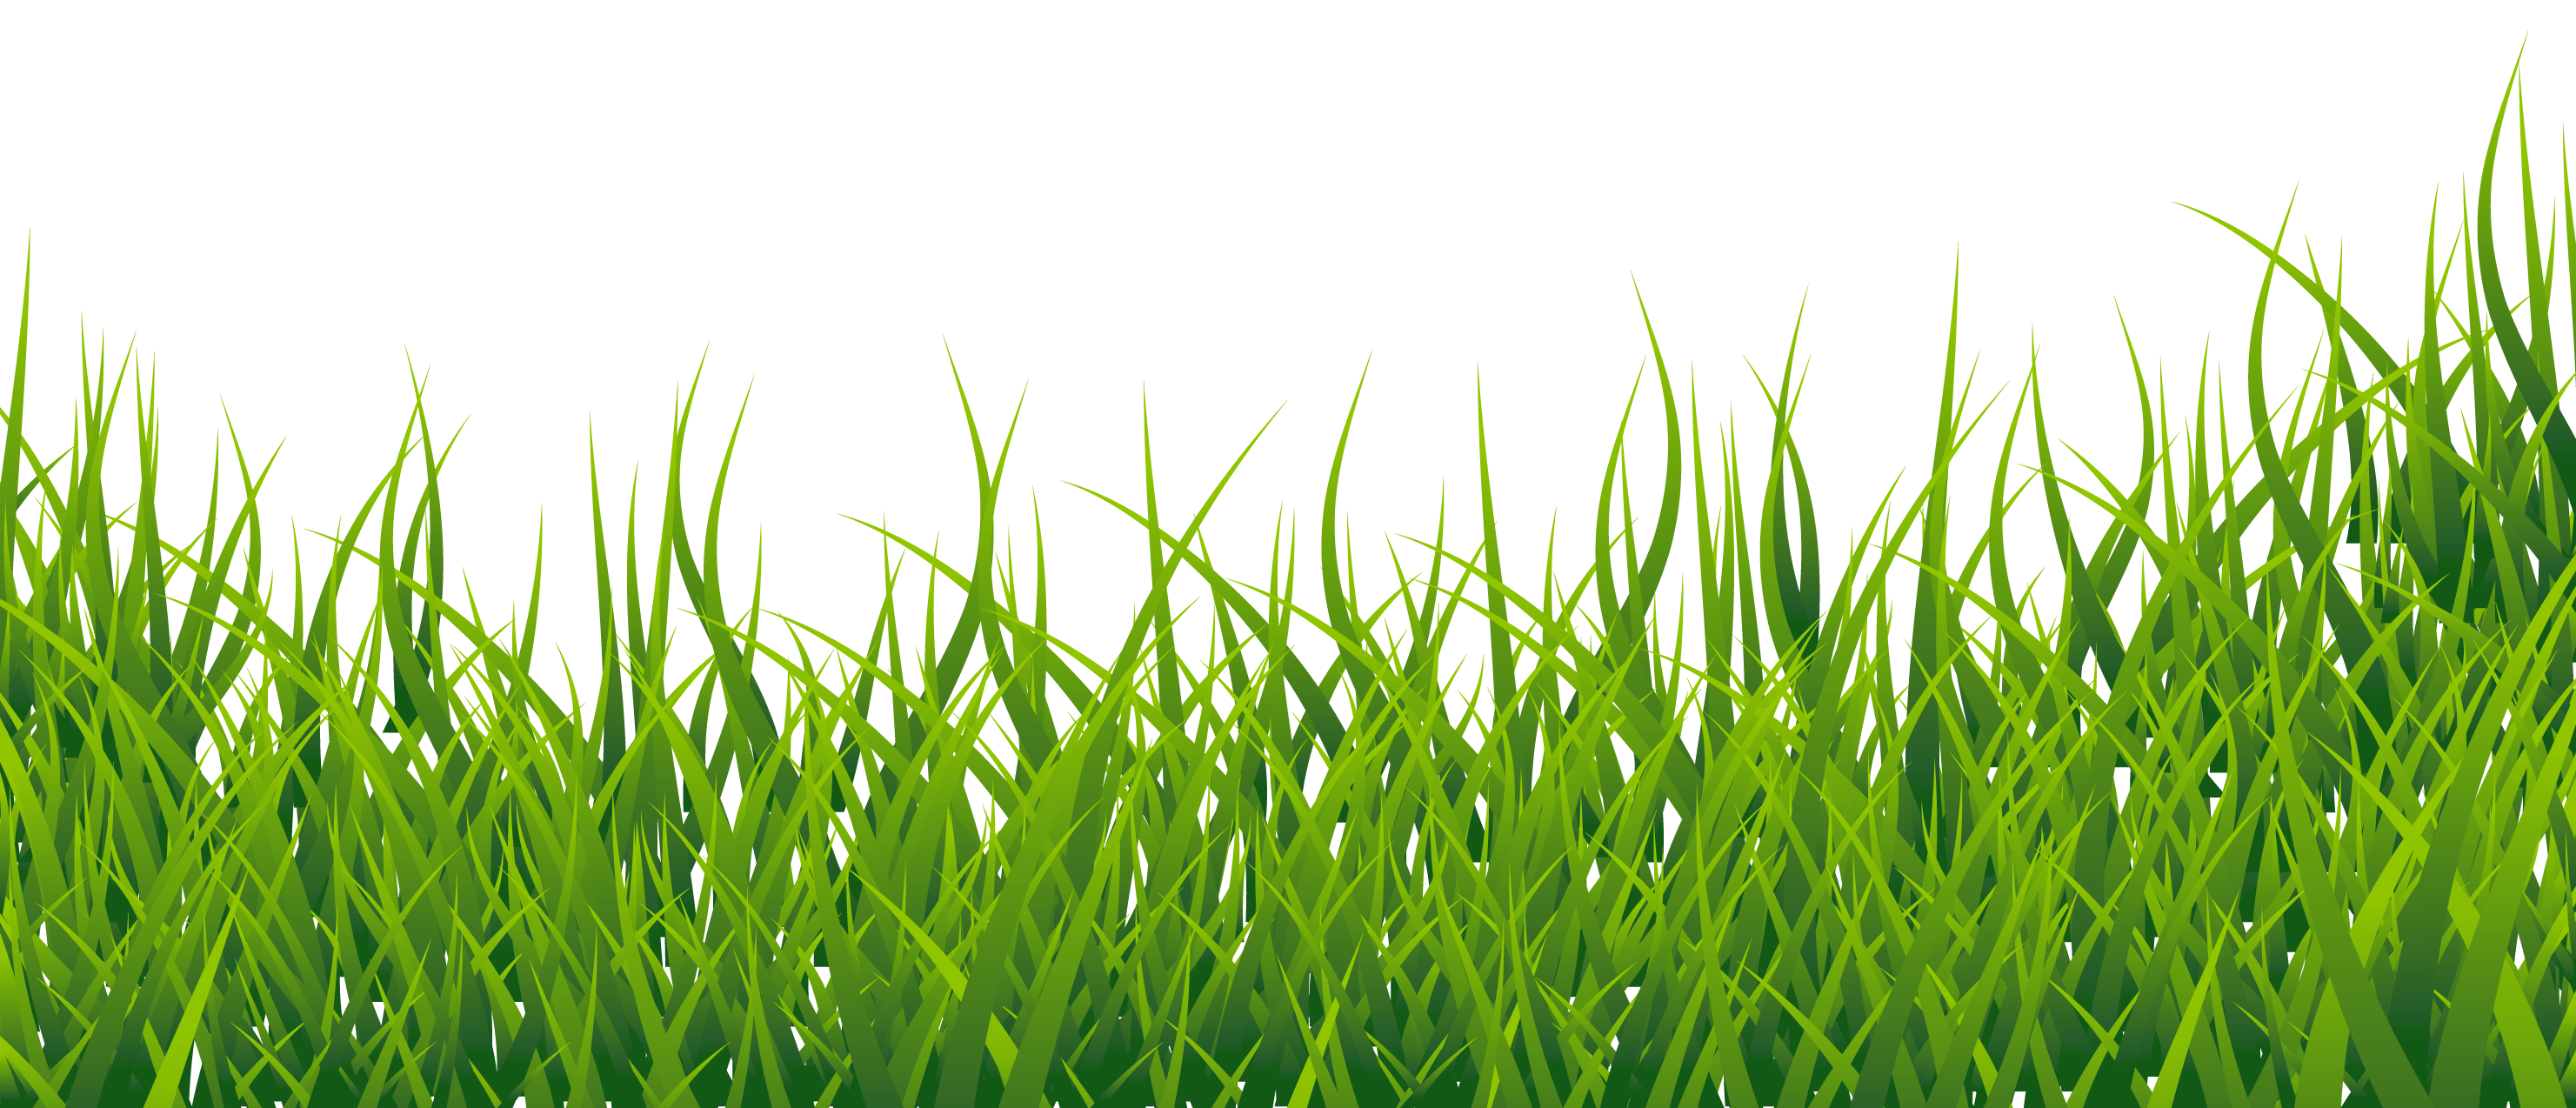 Grass HD PNG - 119870